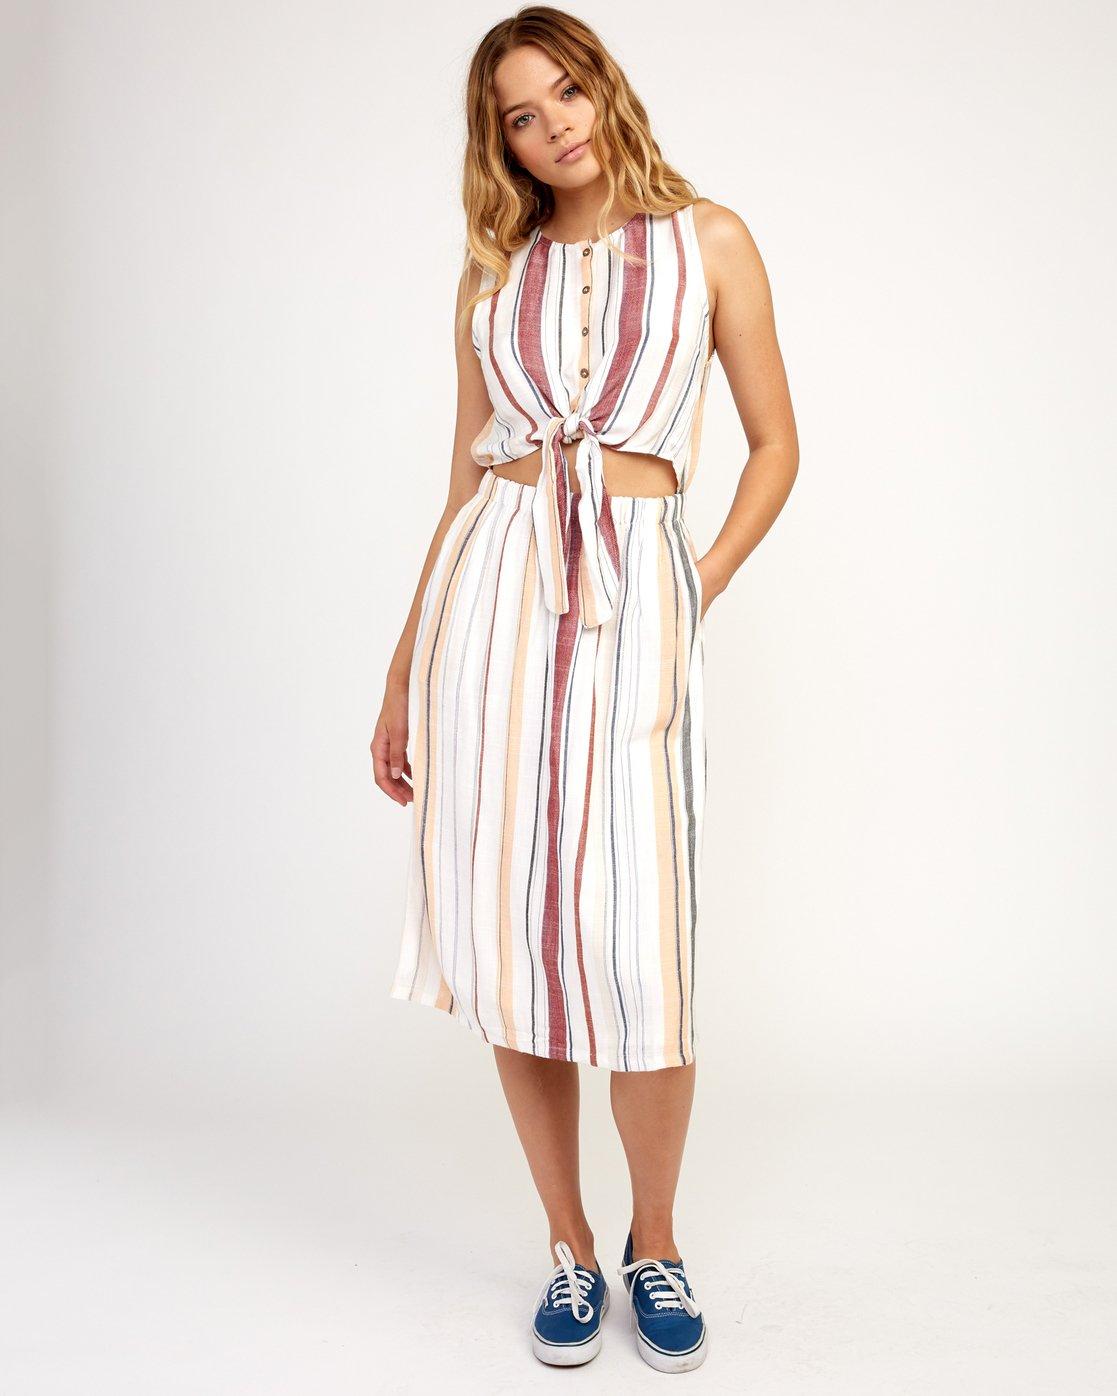 6 Arizona Dress White N3DRRPRVP9 RVCA